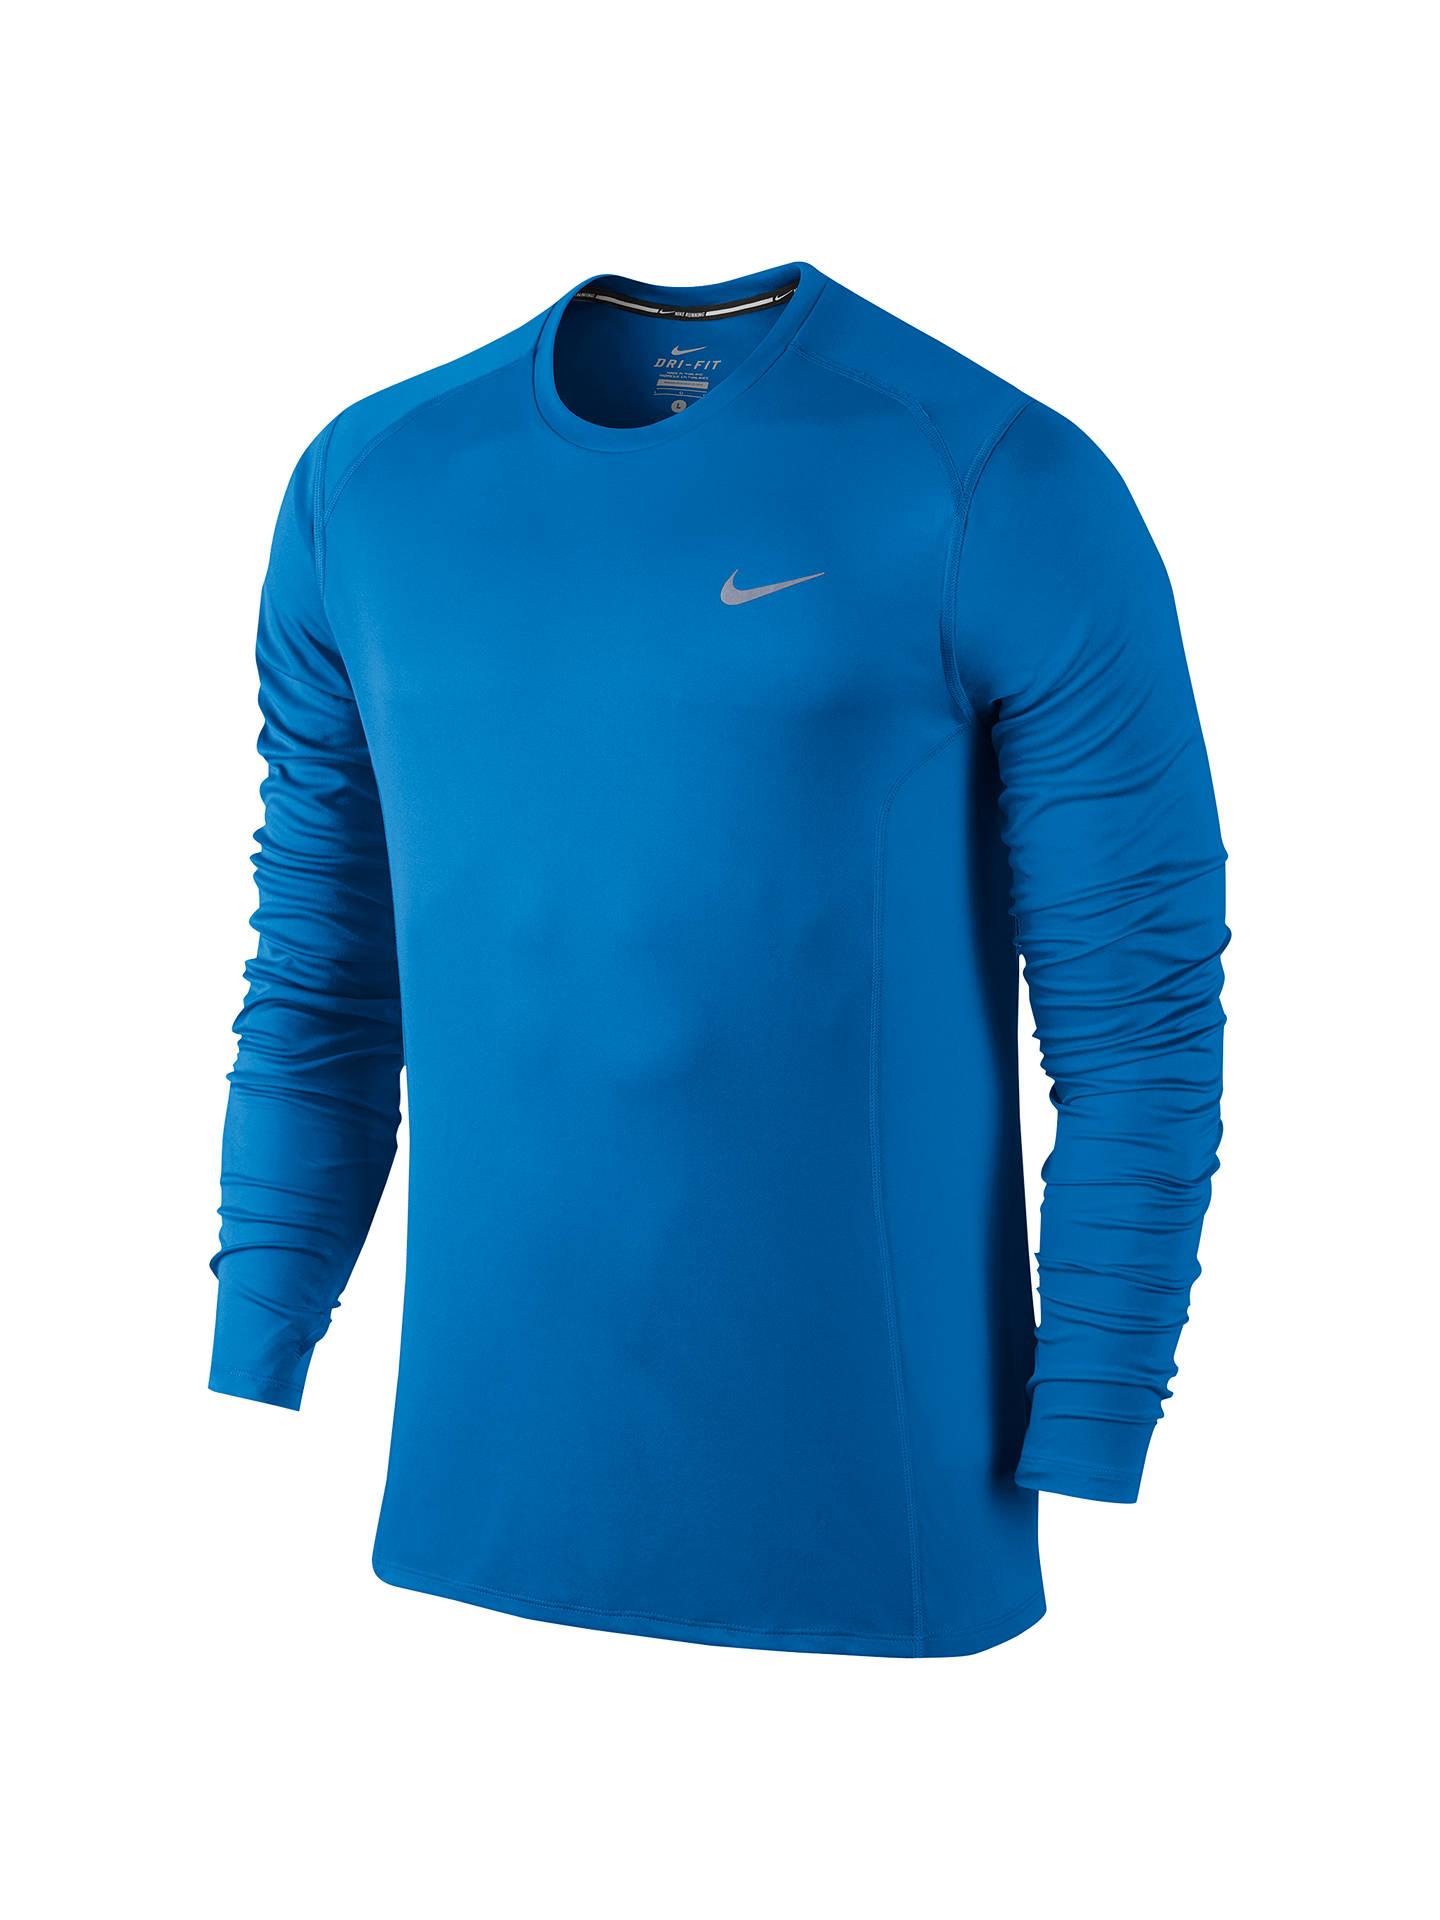 b6d2d22c Buy Nike Dri-FIT Miler Long Sleeve Running Top, Blue, S Online at ...